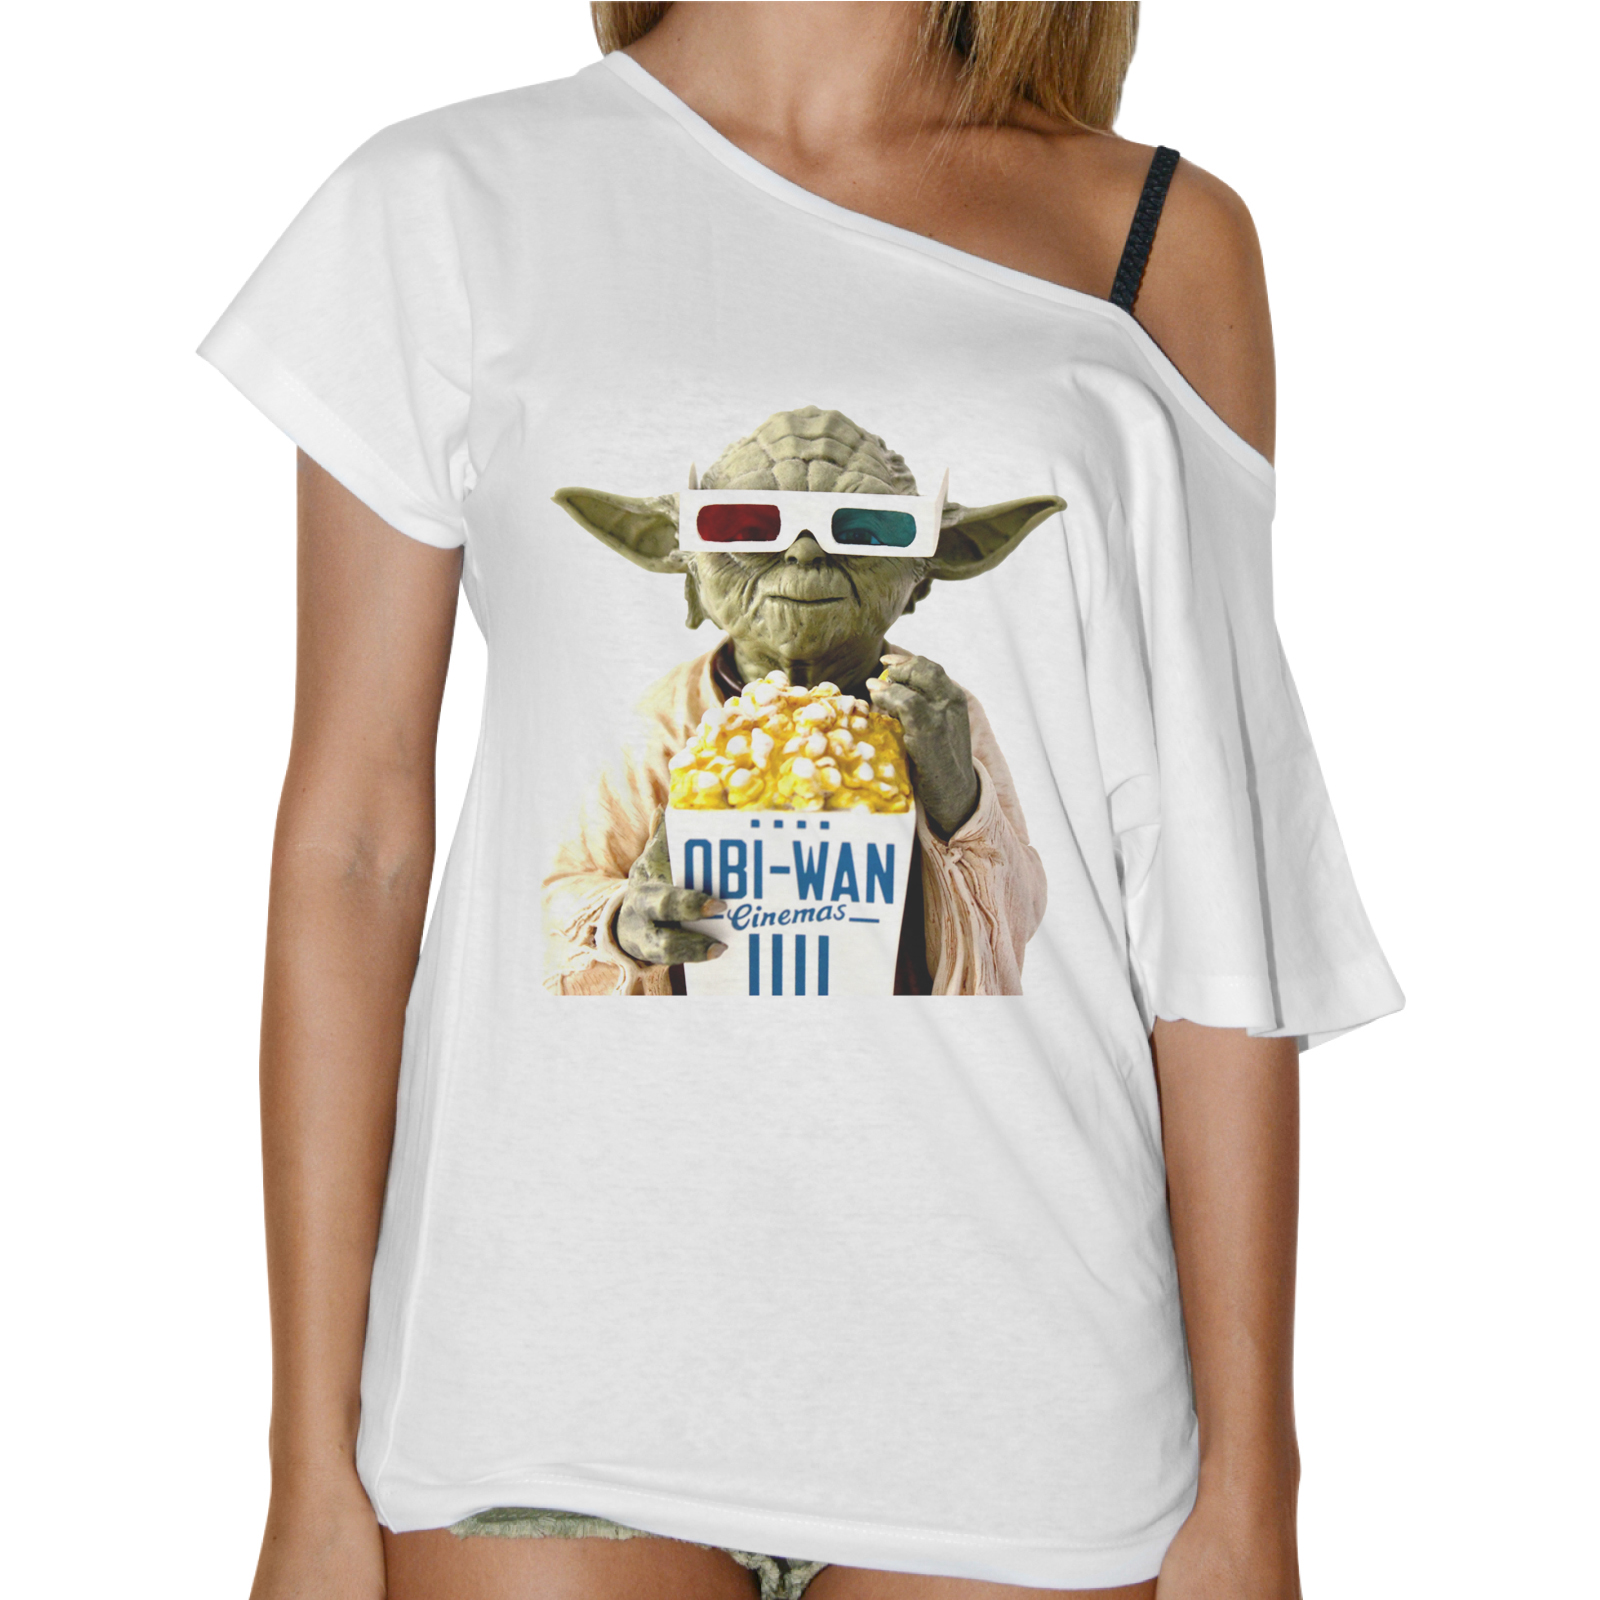 T-Shirt Donna Collo Barca OBI POP CORN 1